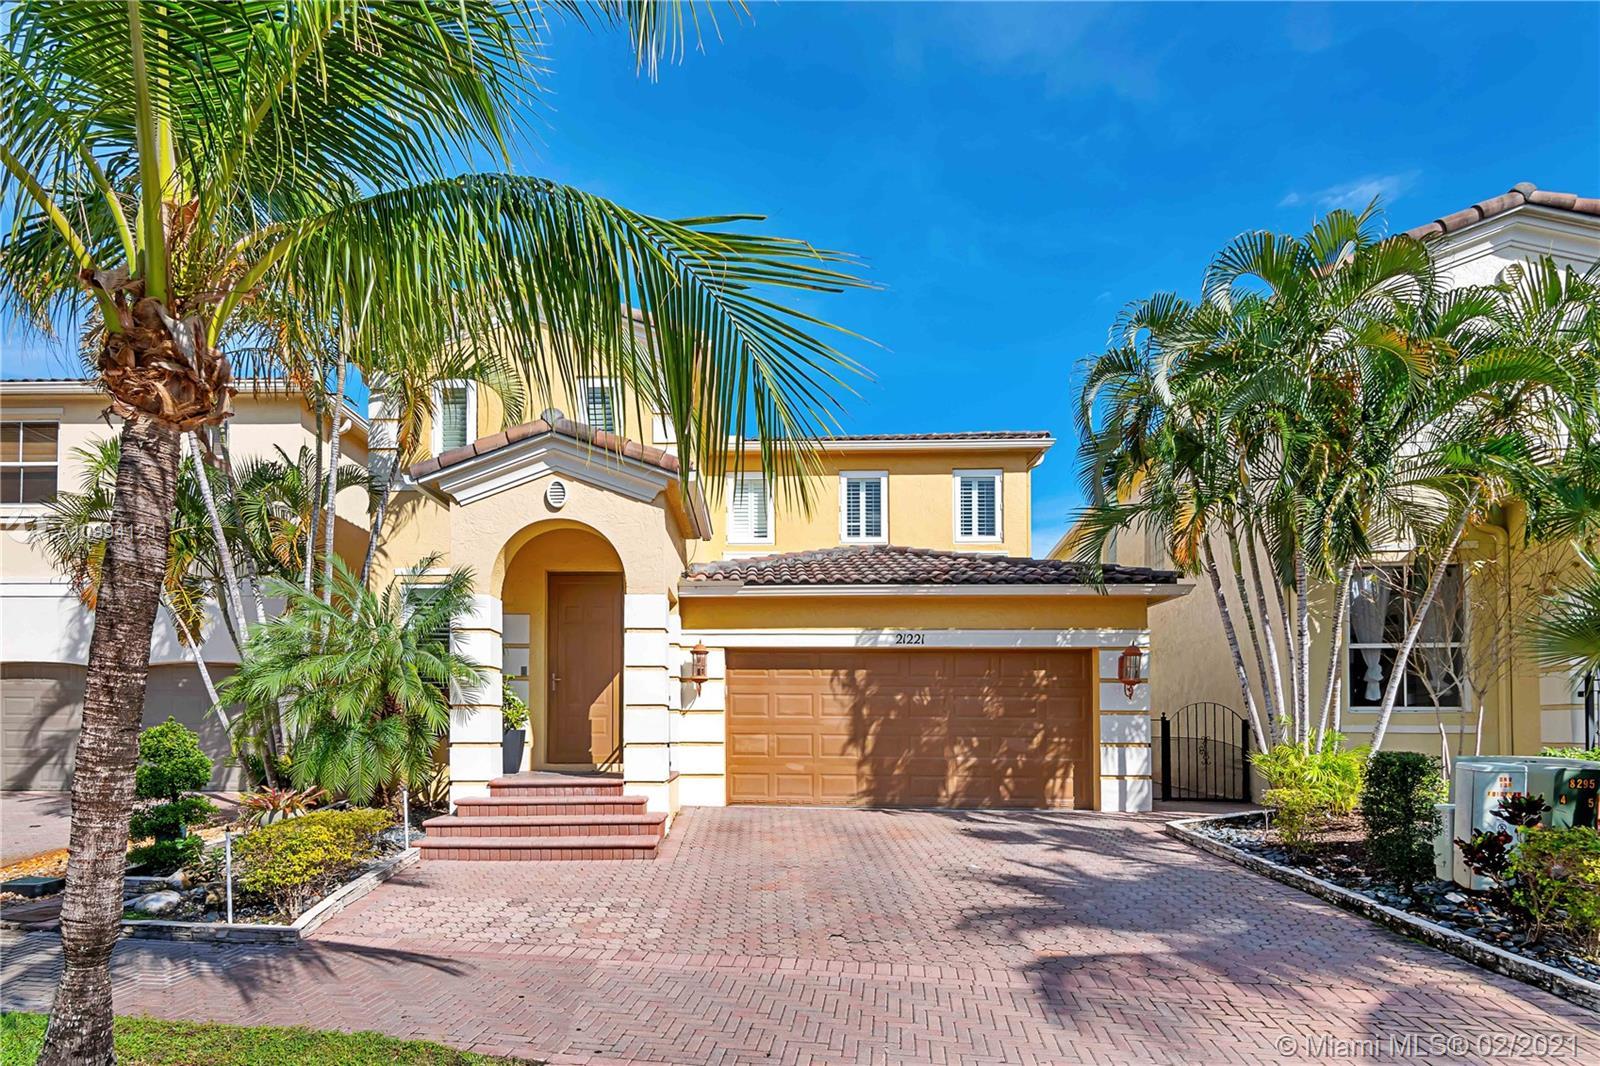 Photo of 21221 31st Pl, Aventura, Florida, 33180 -